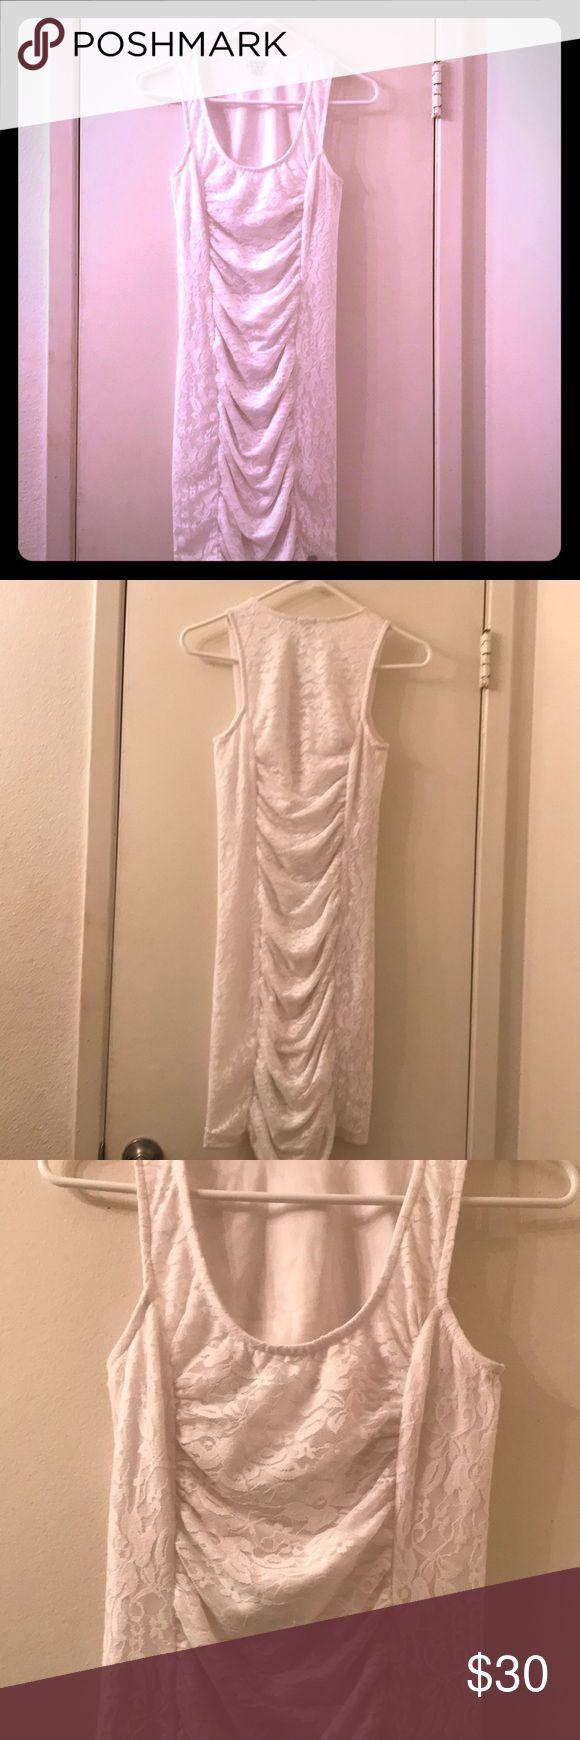 ✨BNWOT White Lace Guess Dress XS✨ Sexy white lace minidress from Guess. Brand new without tags! Size XS. Guess Dresses Mini